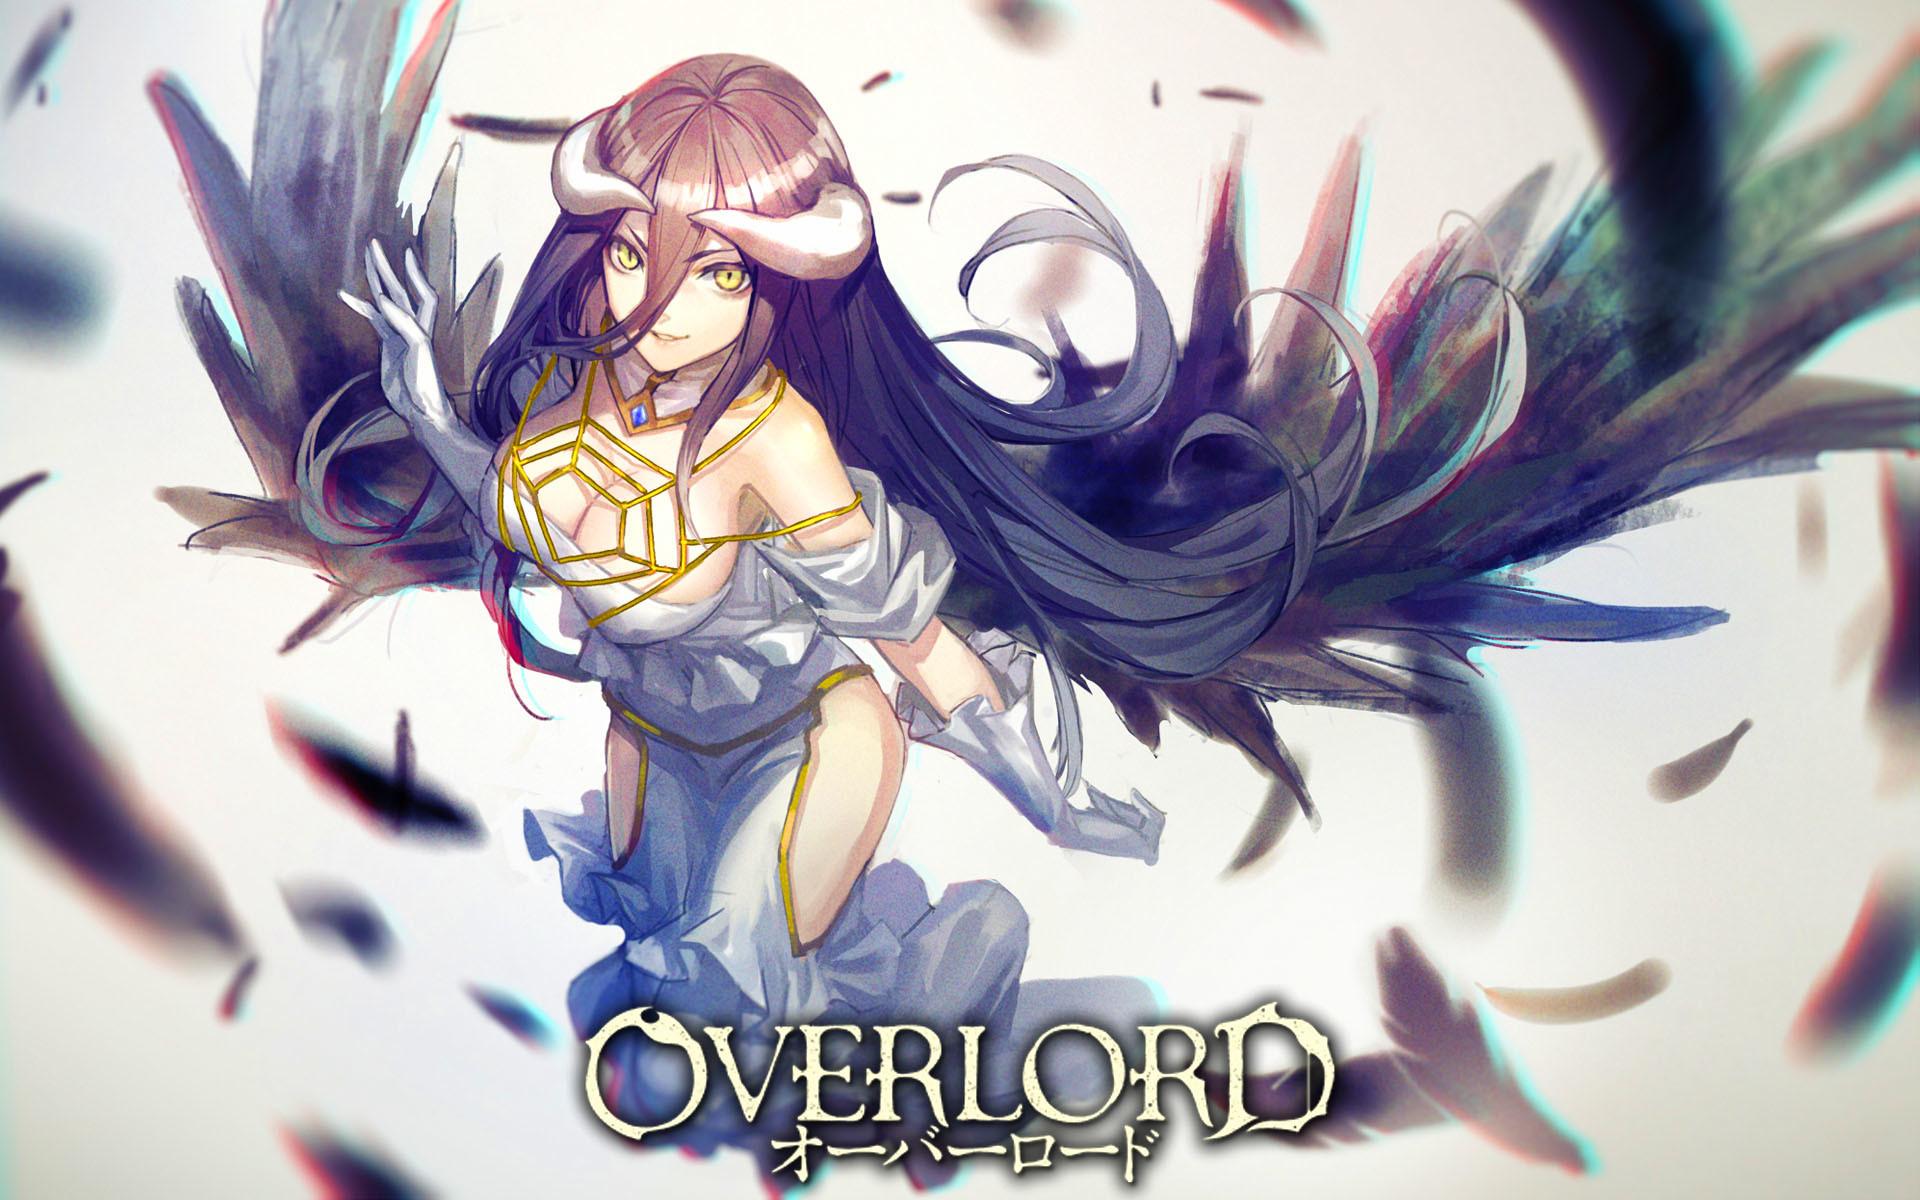 albedo overlord wallpaper 5